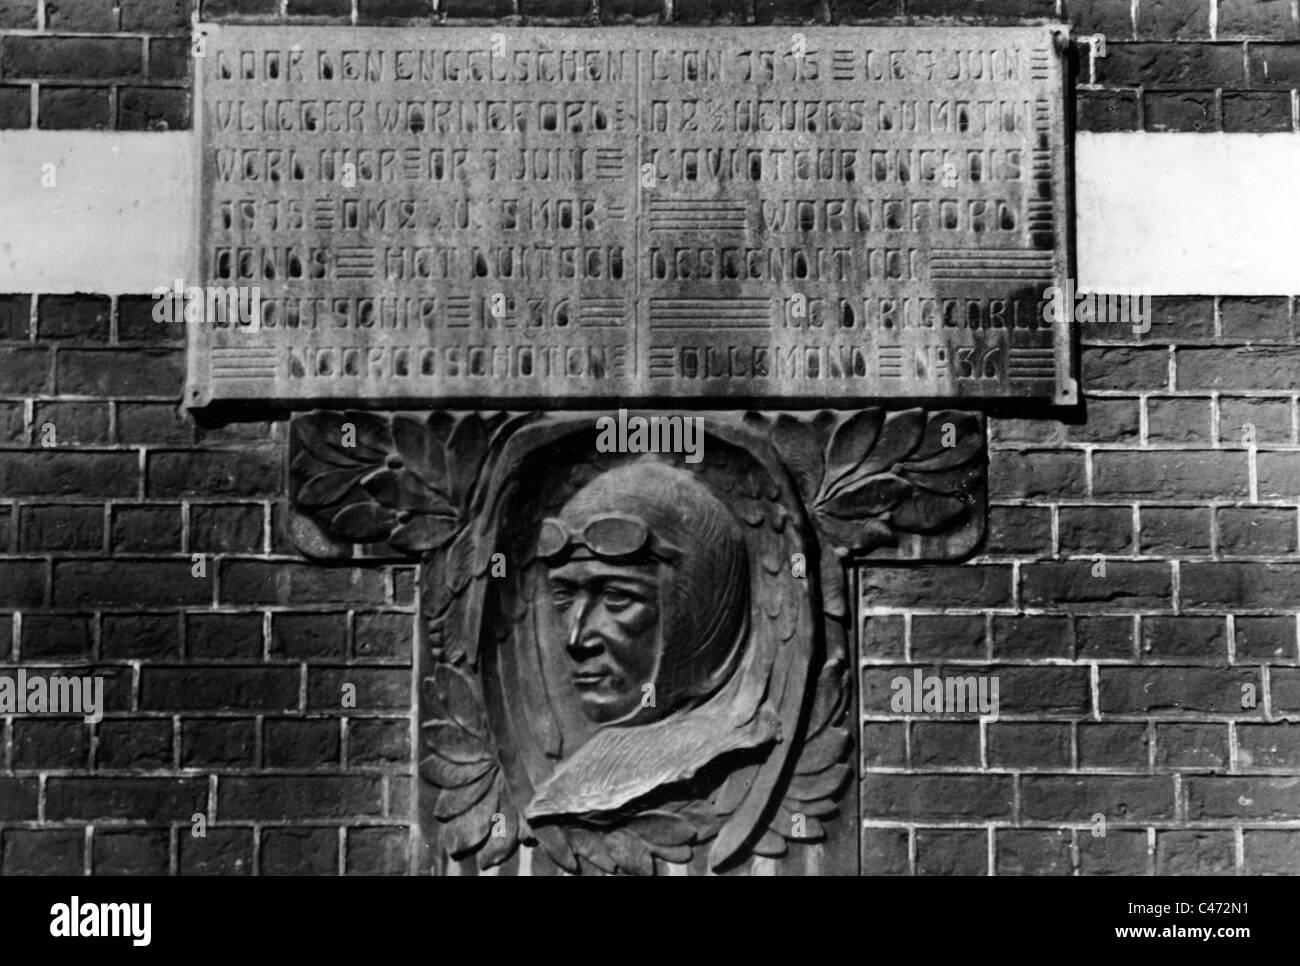 Memorial plaque for British airman Lt. Reginald Warneford - Stock Image